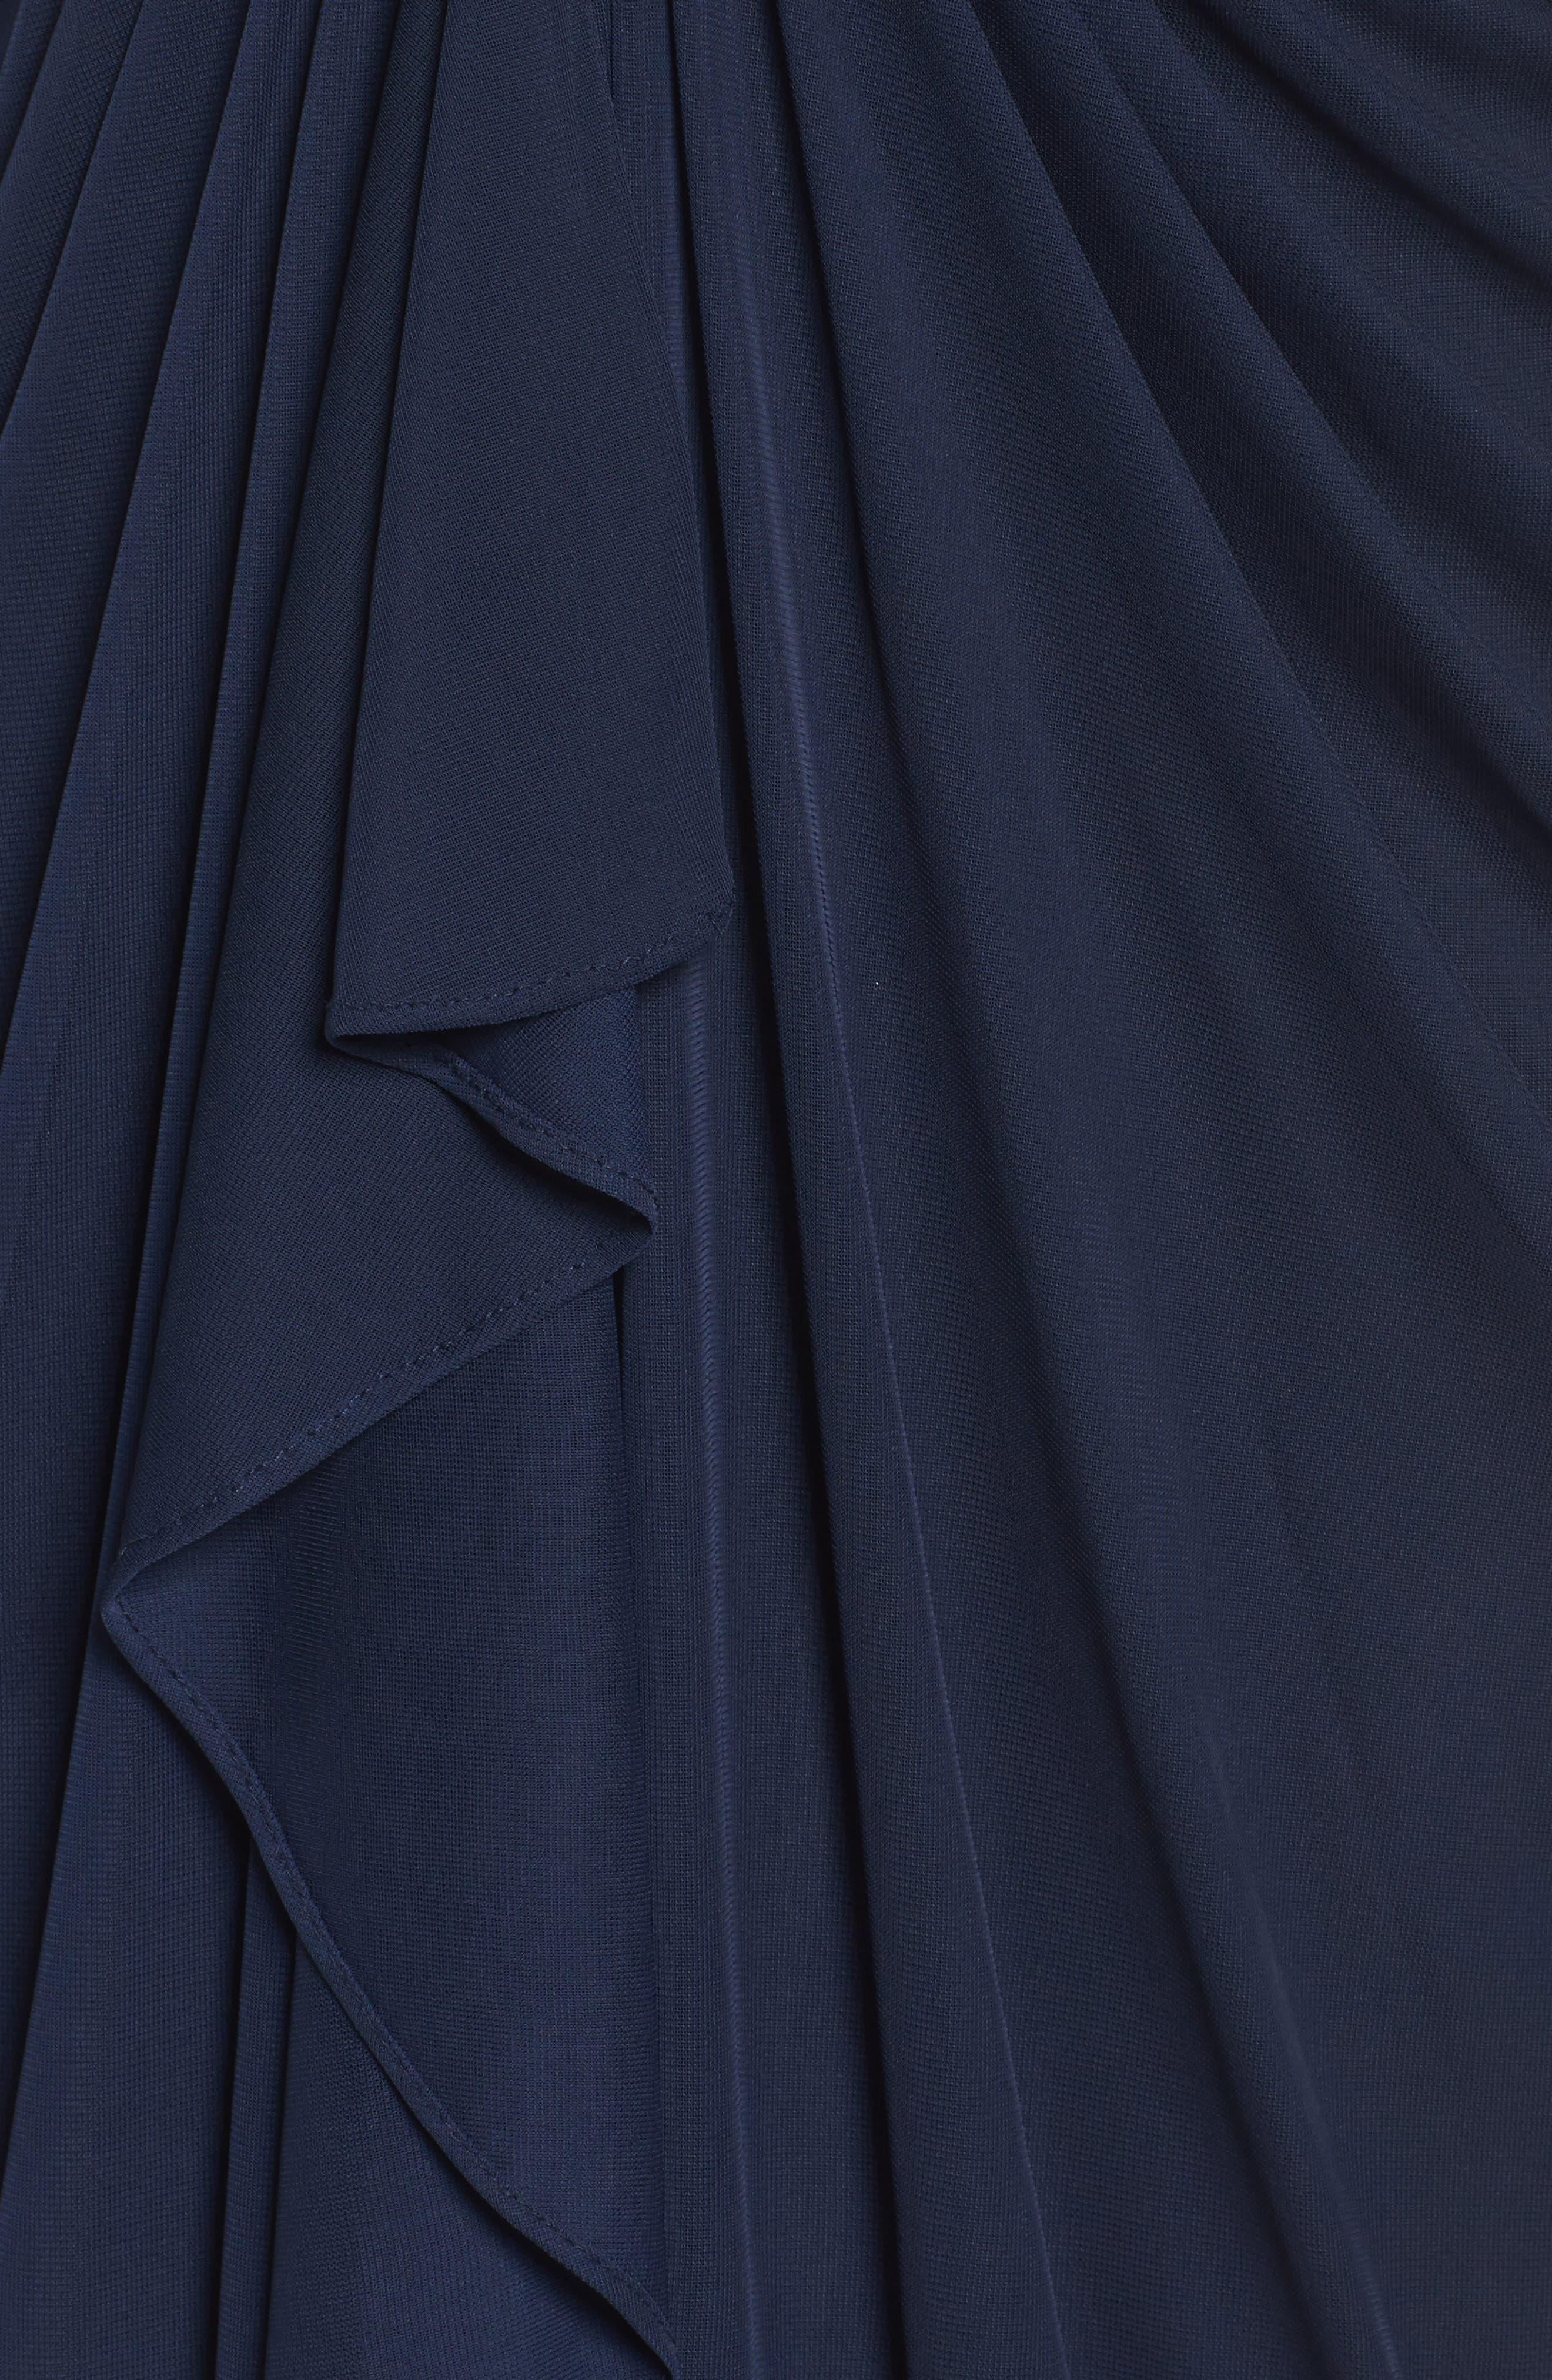 Draped Mesh Gown,                             Alternate thumbnail 5, color,                             411